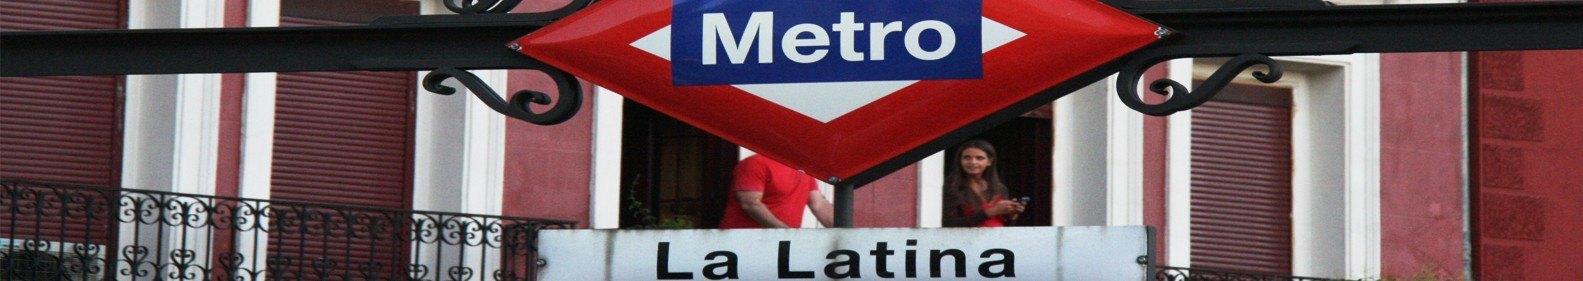 Aula-La-Latina